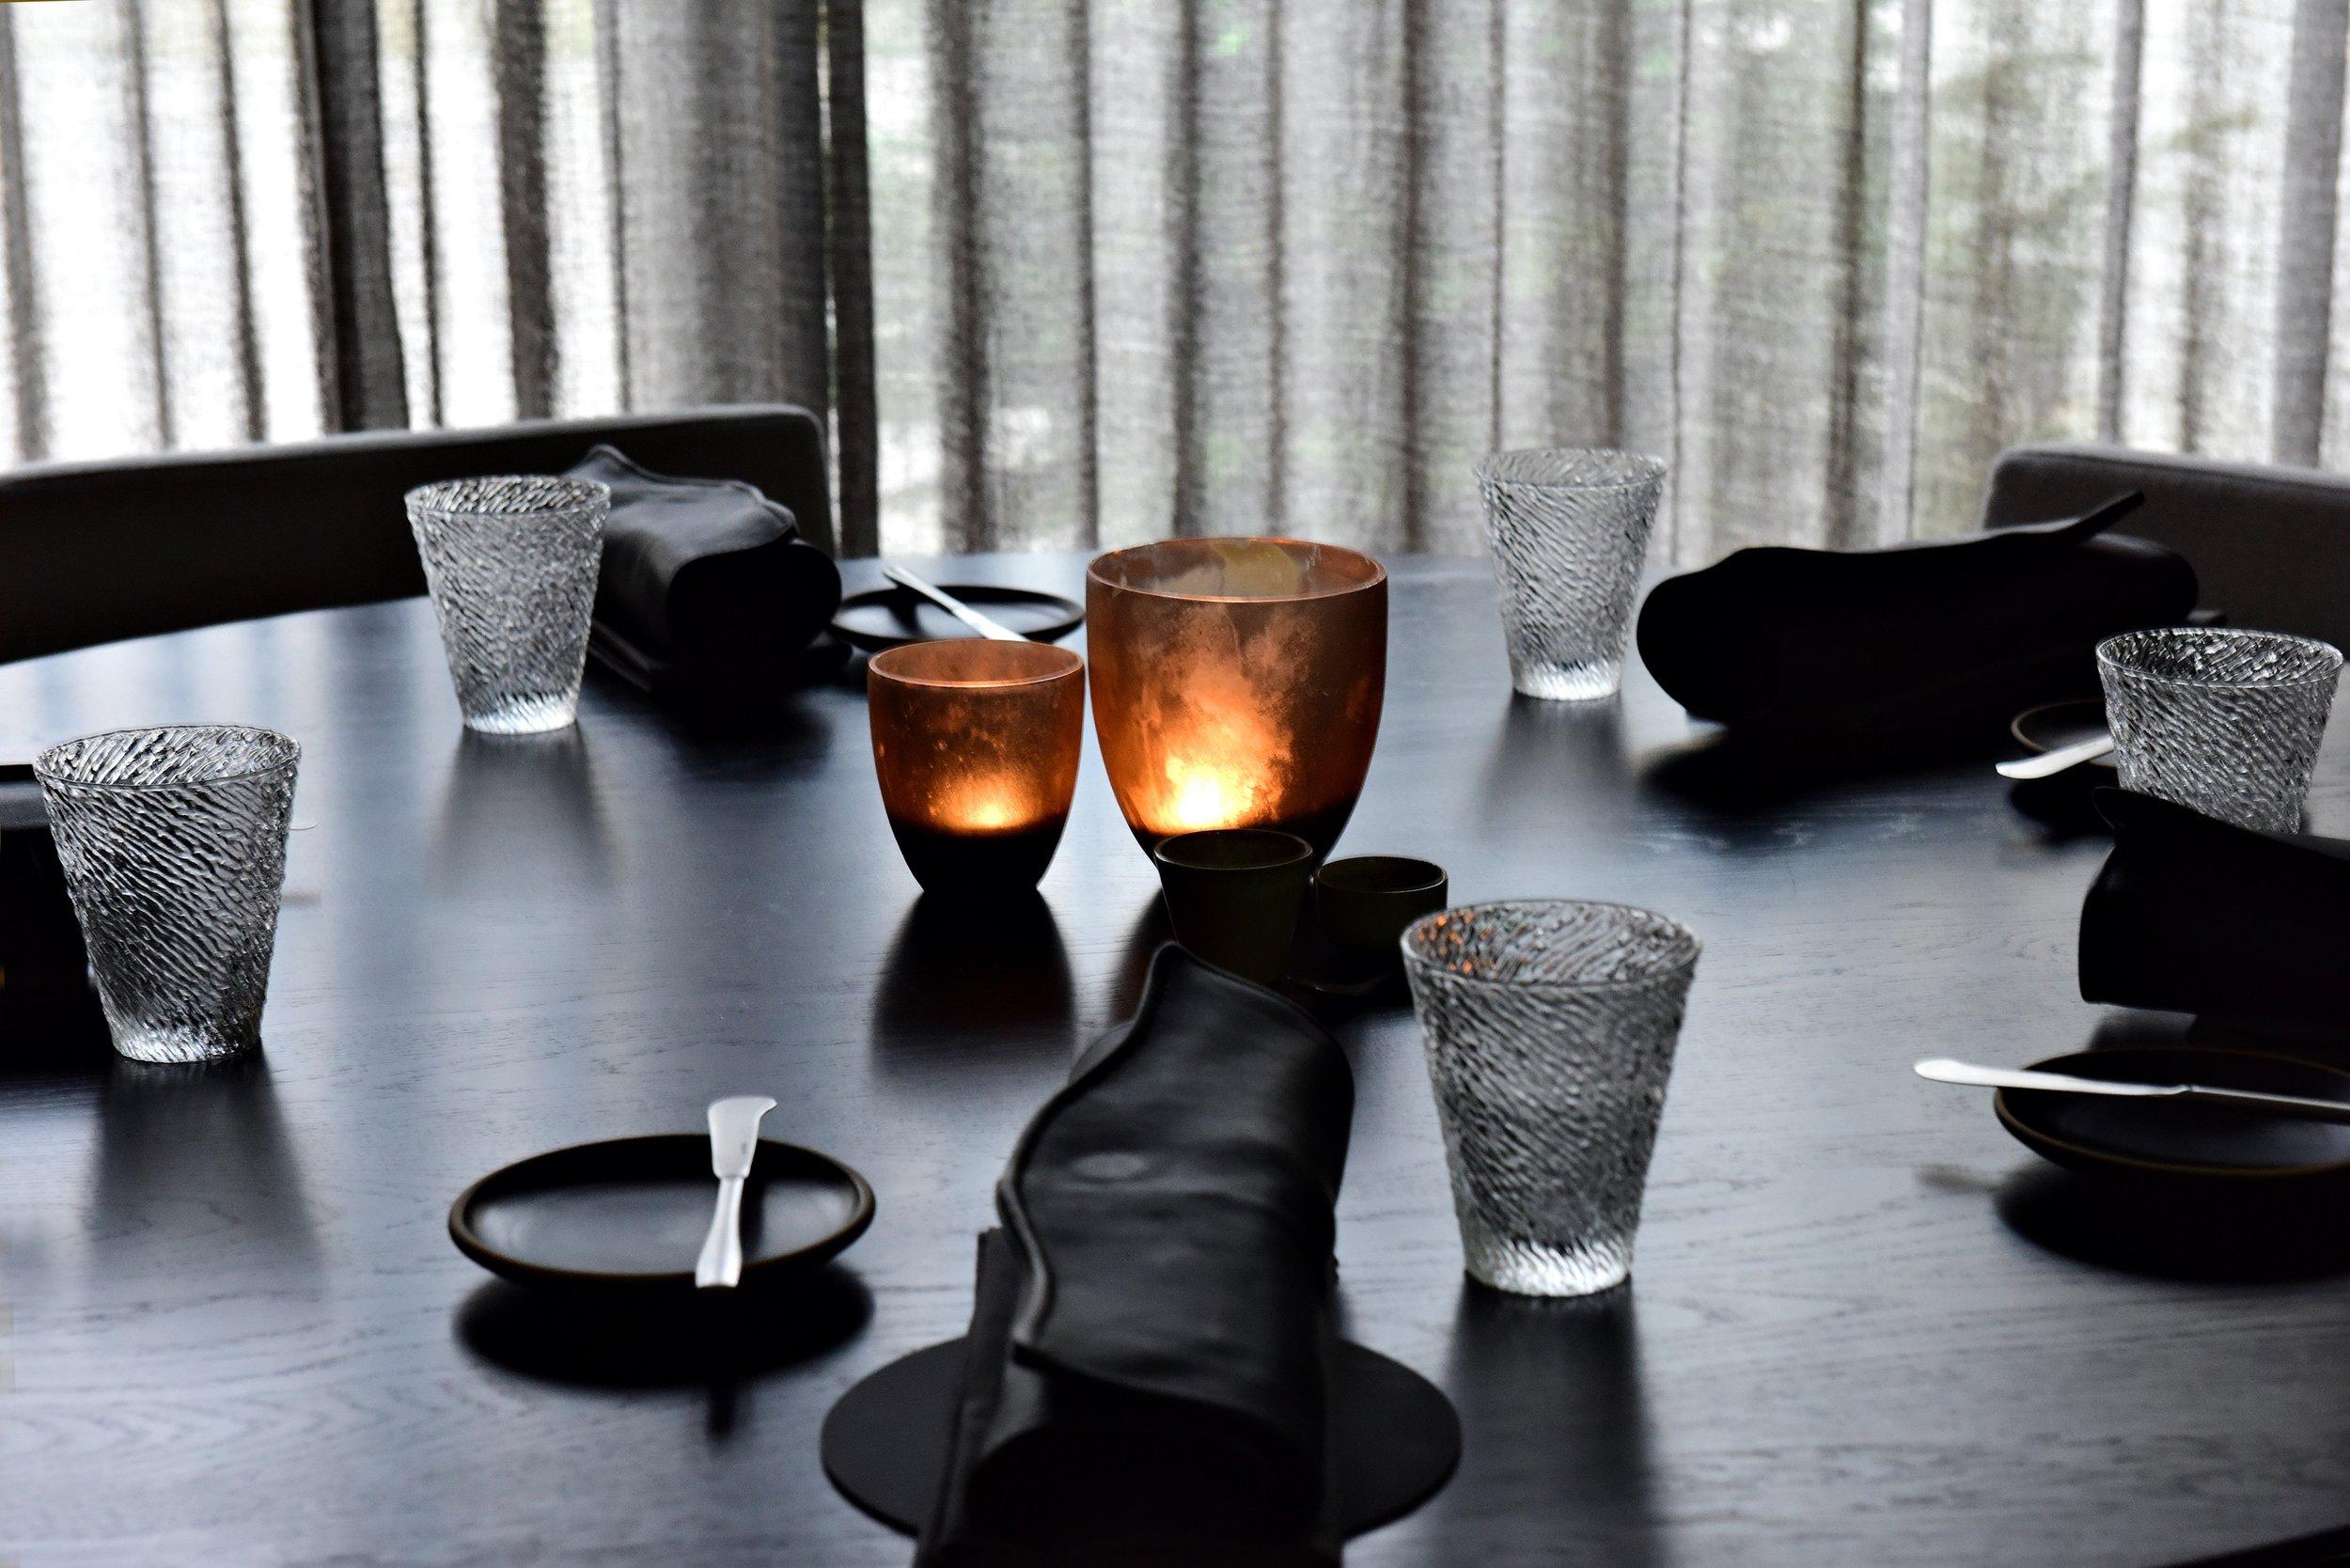 14 eed restaurant hertog jan leuven beste bart albrecht fotograaf food tablefever.jpg